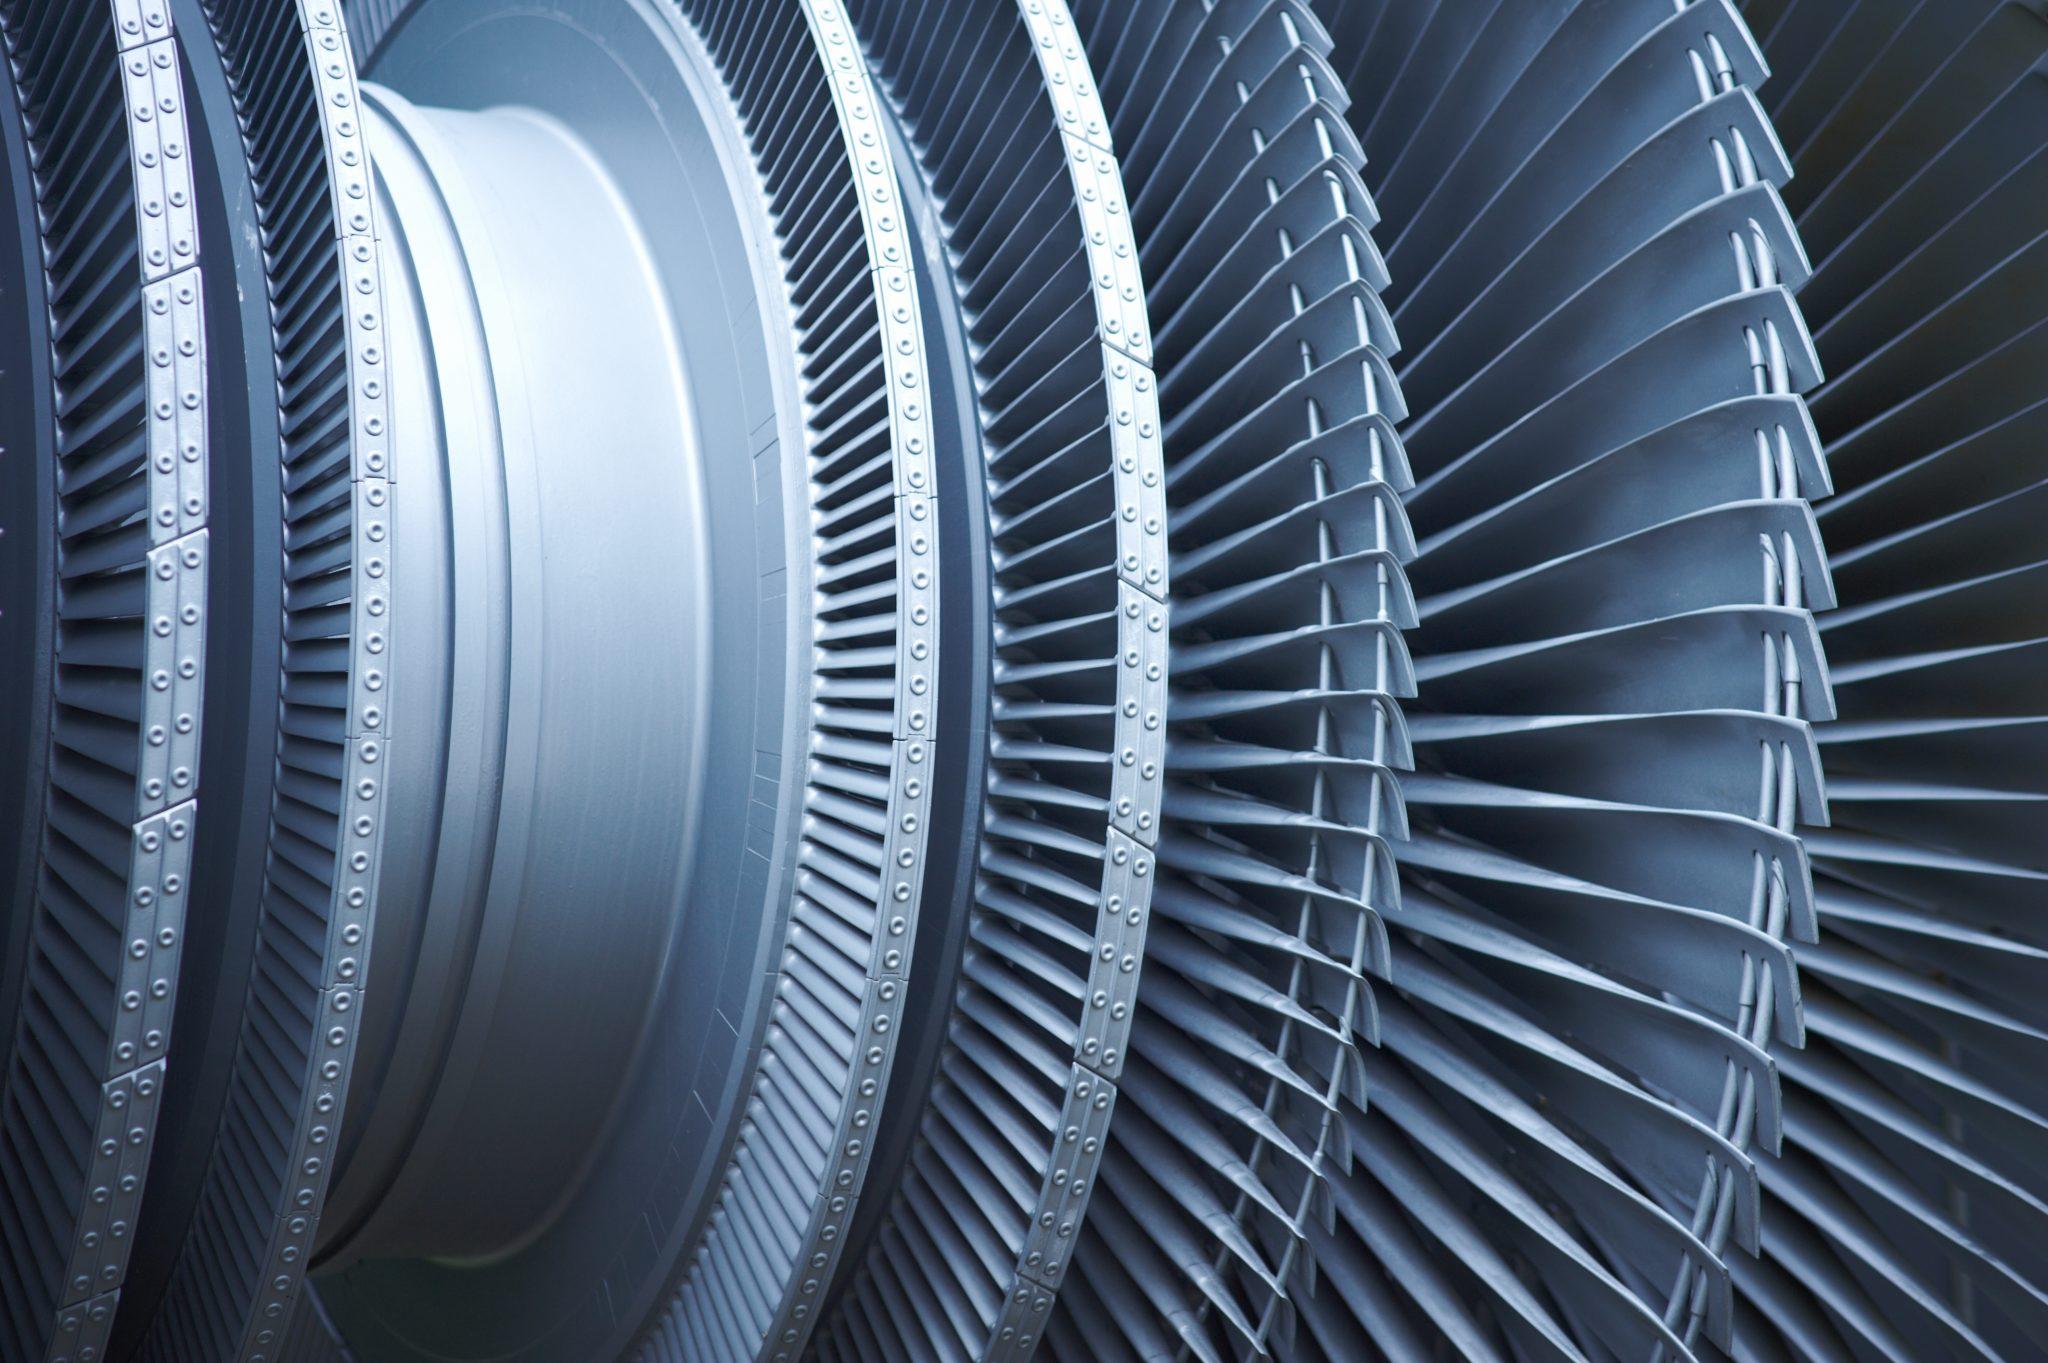 Close-up of Turbine Fan Blades